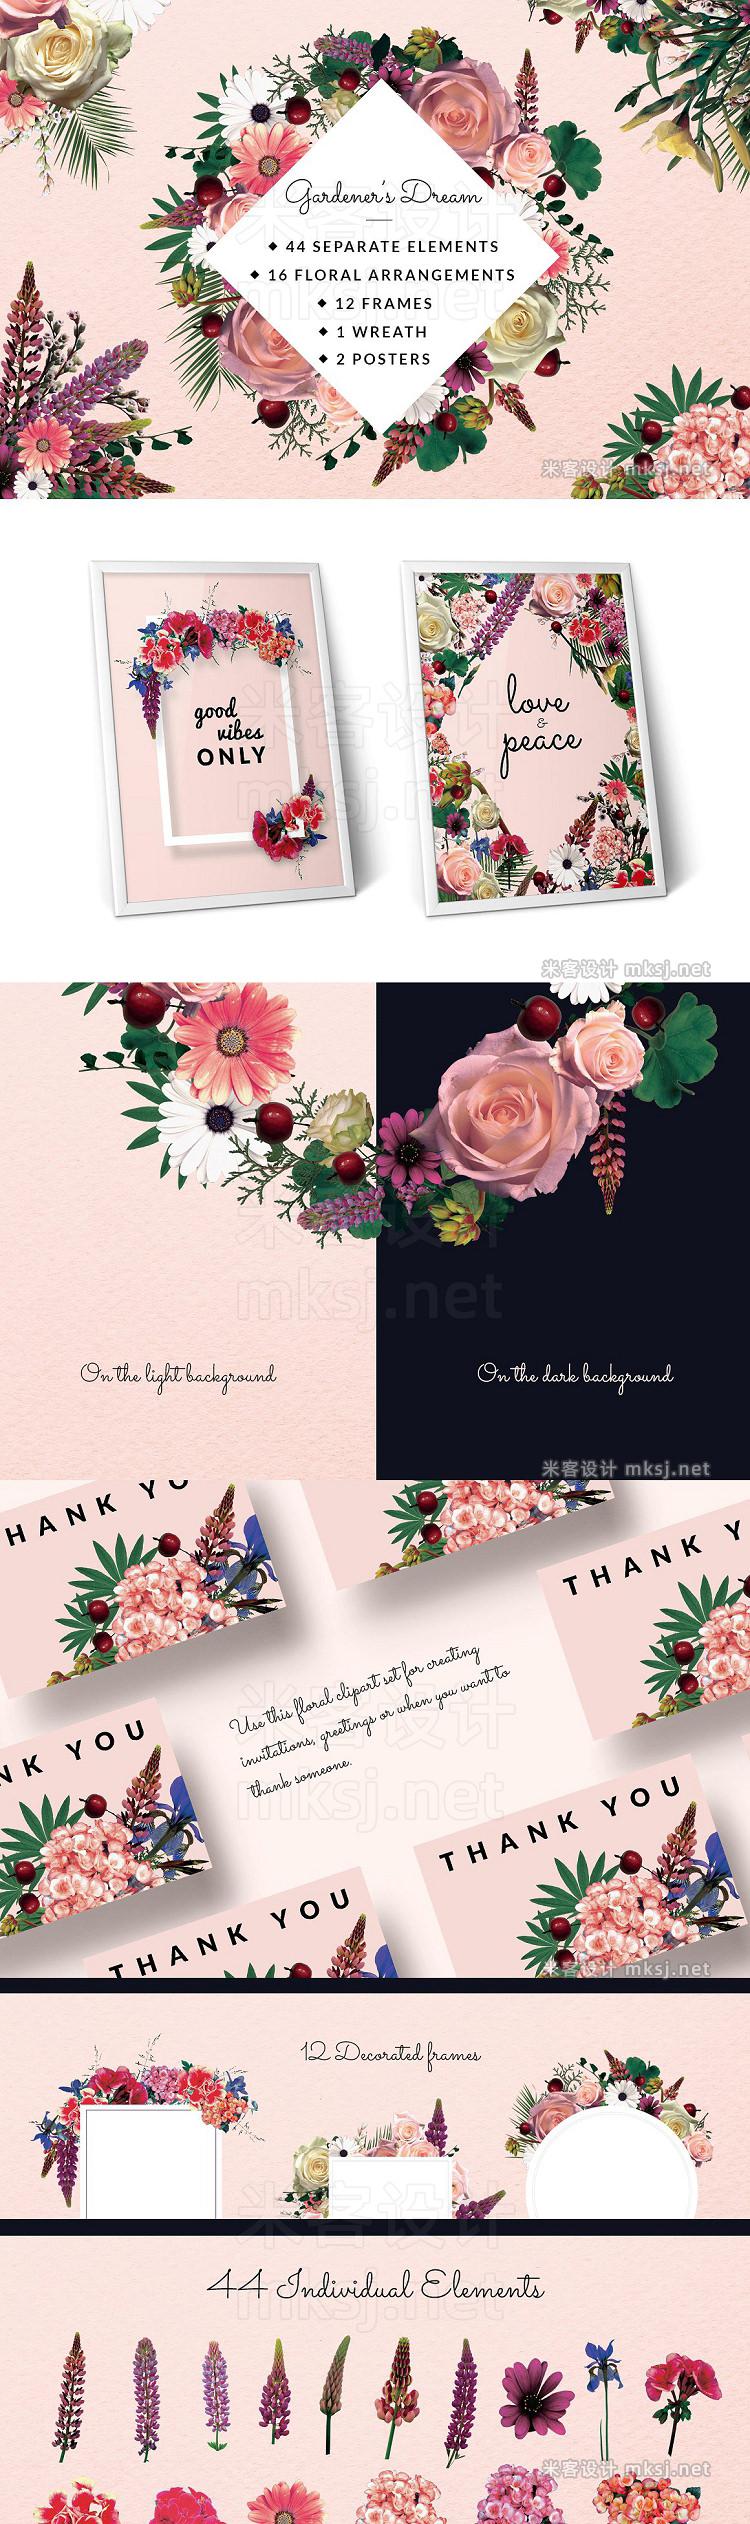 png素材 Gardener's Dream - real flowers' set